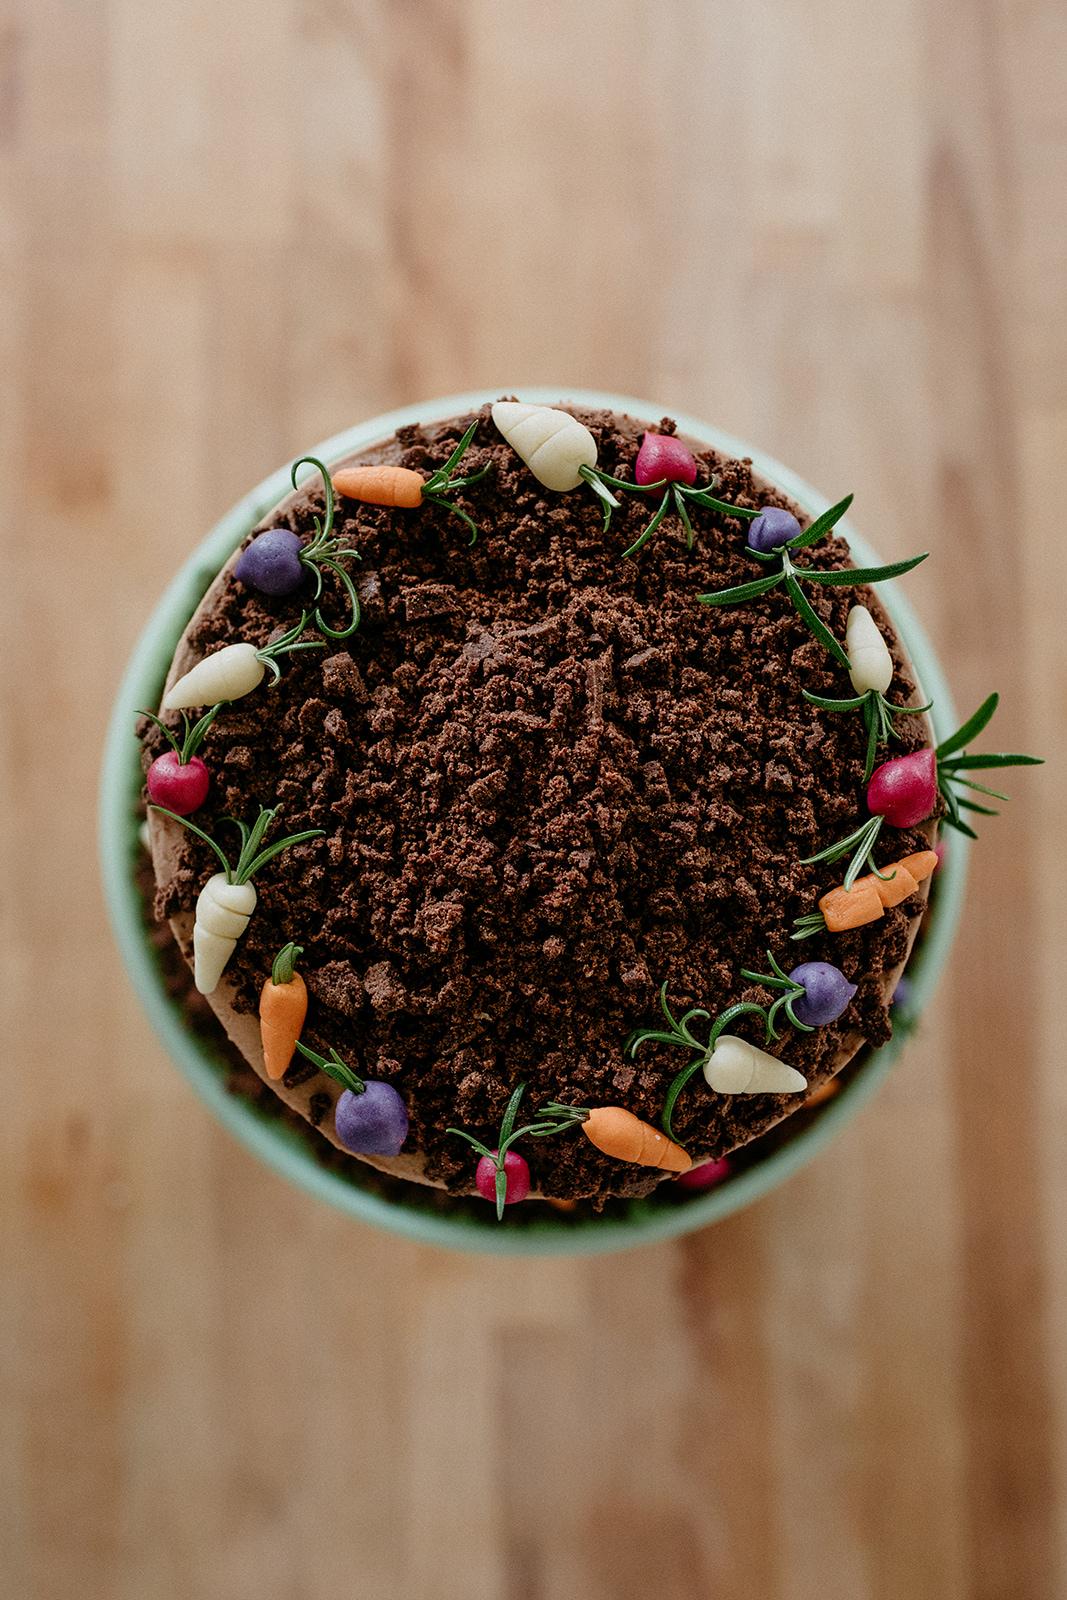 molly-yeh-girl-meets-farm-cake-12.jpg